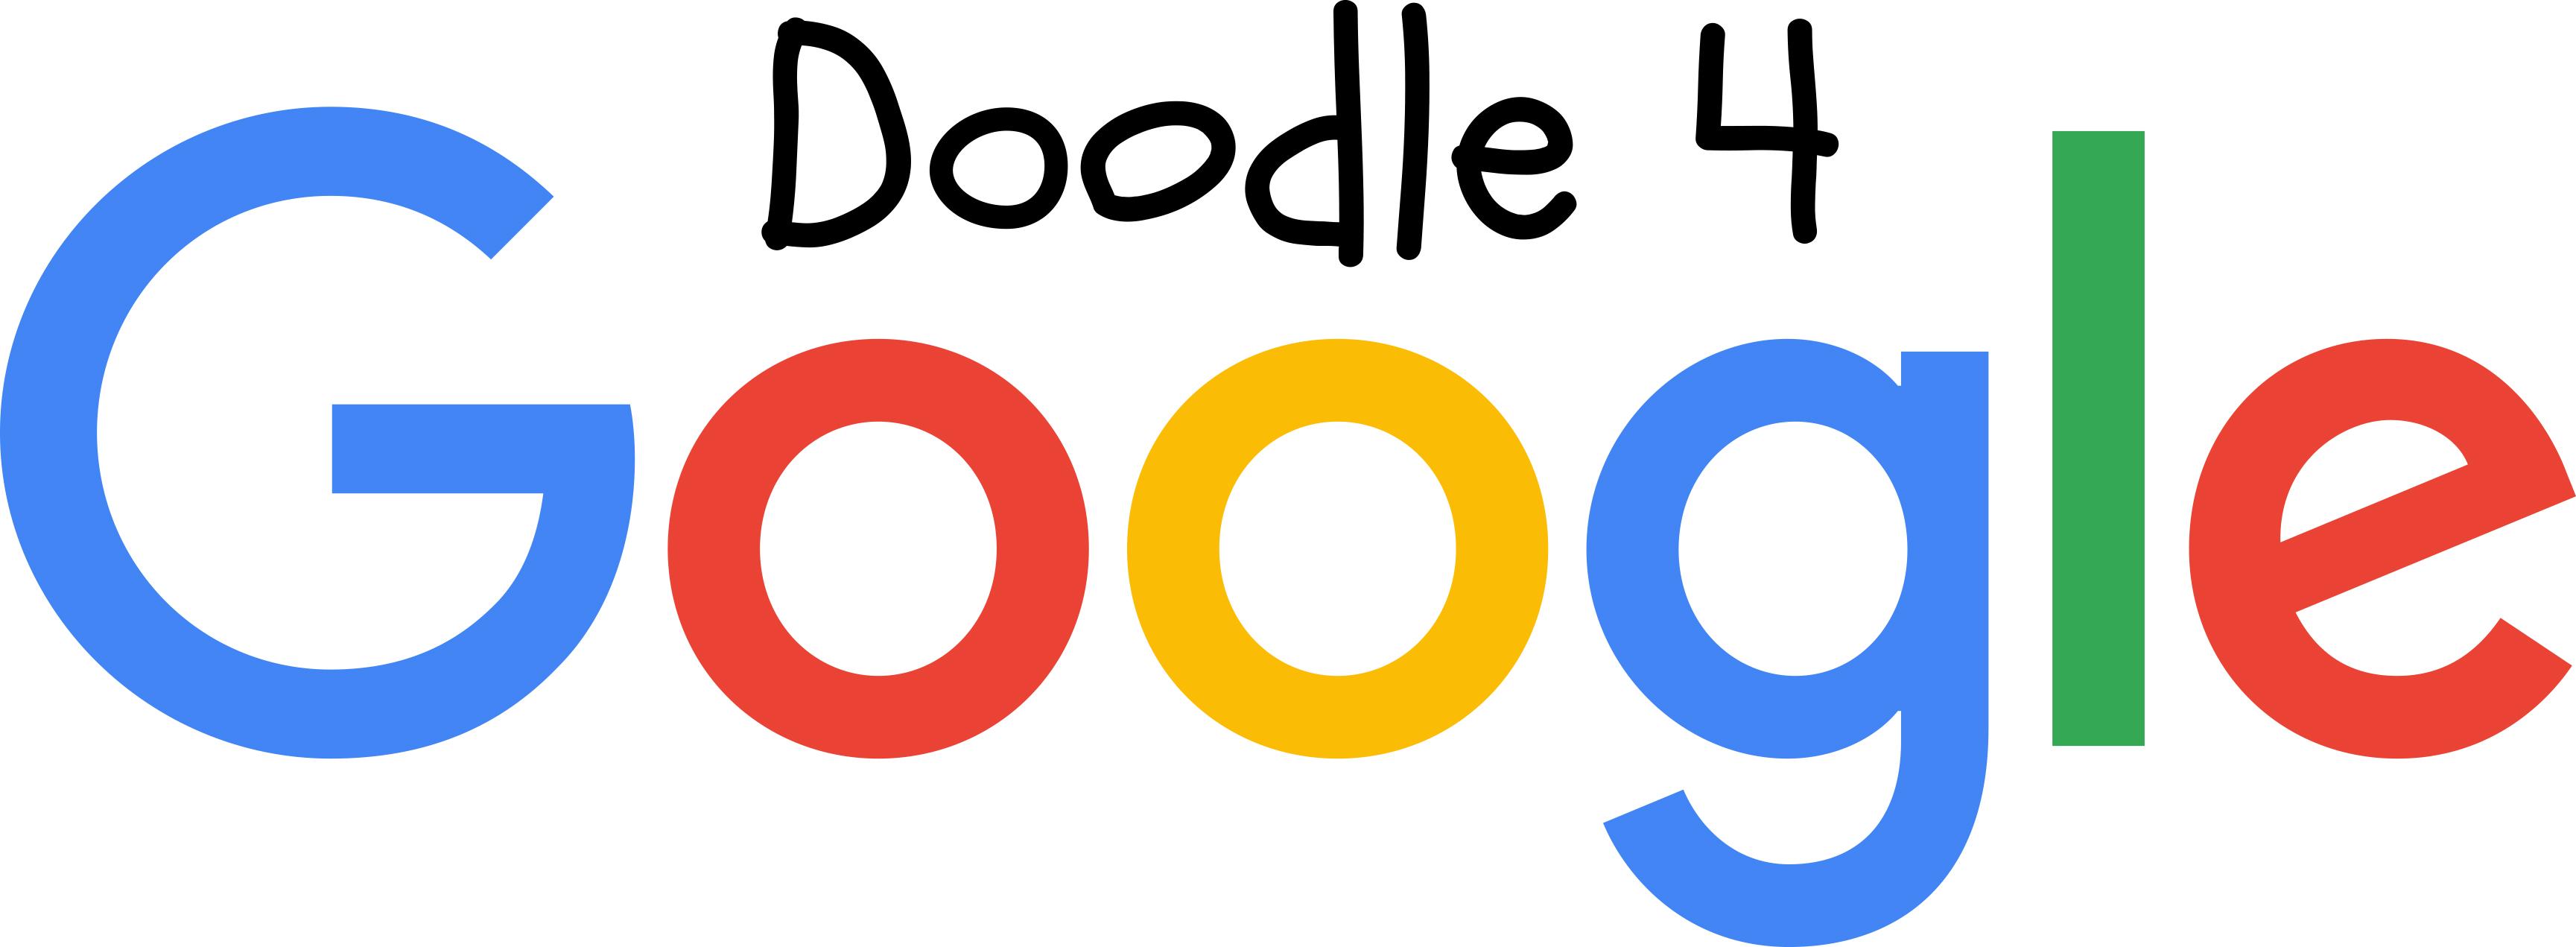 Clipart google - Google Clip Art